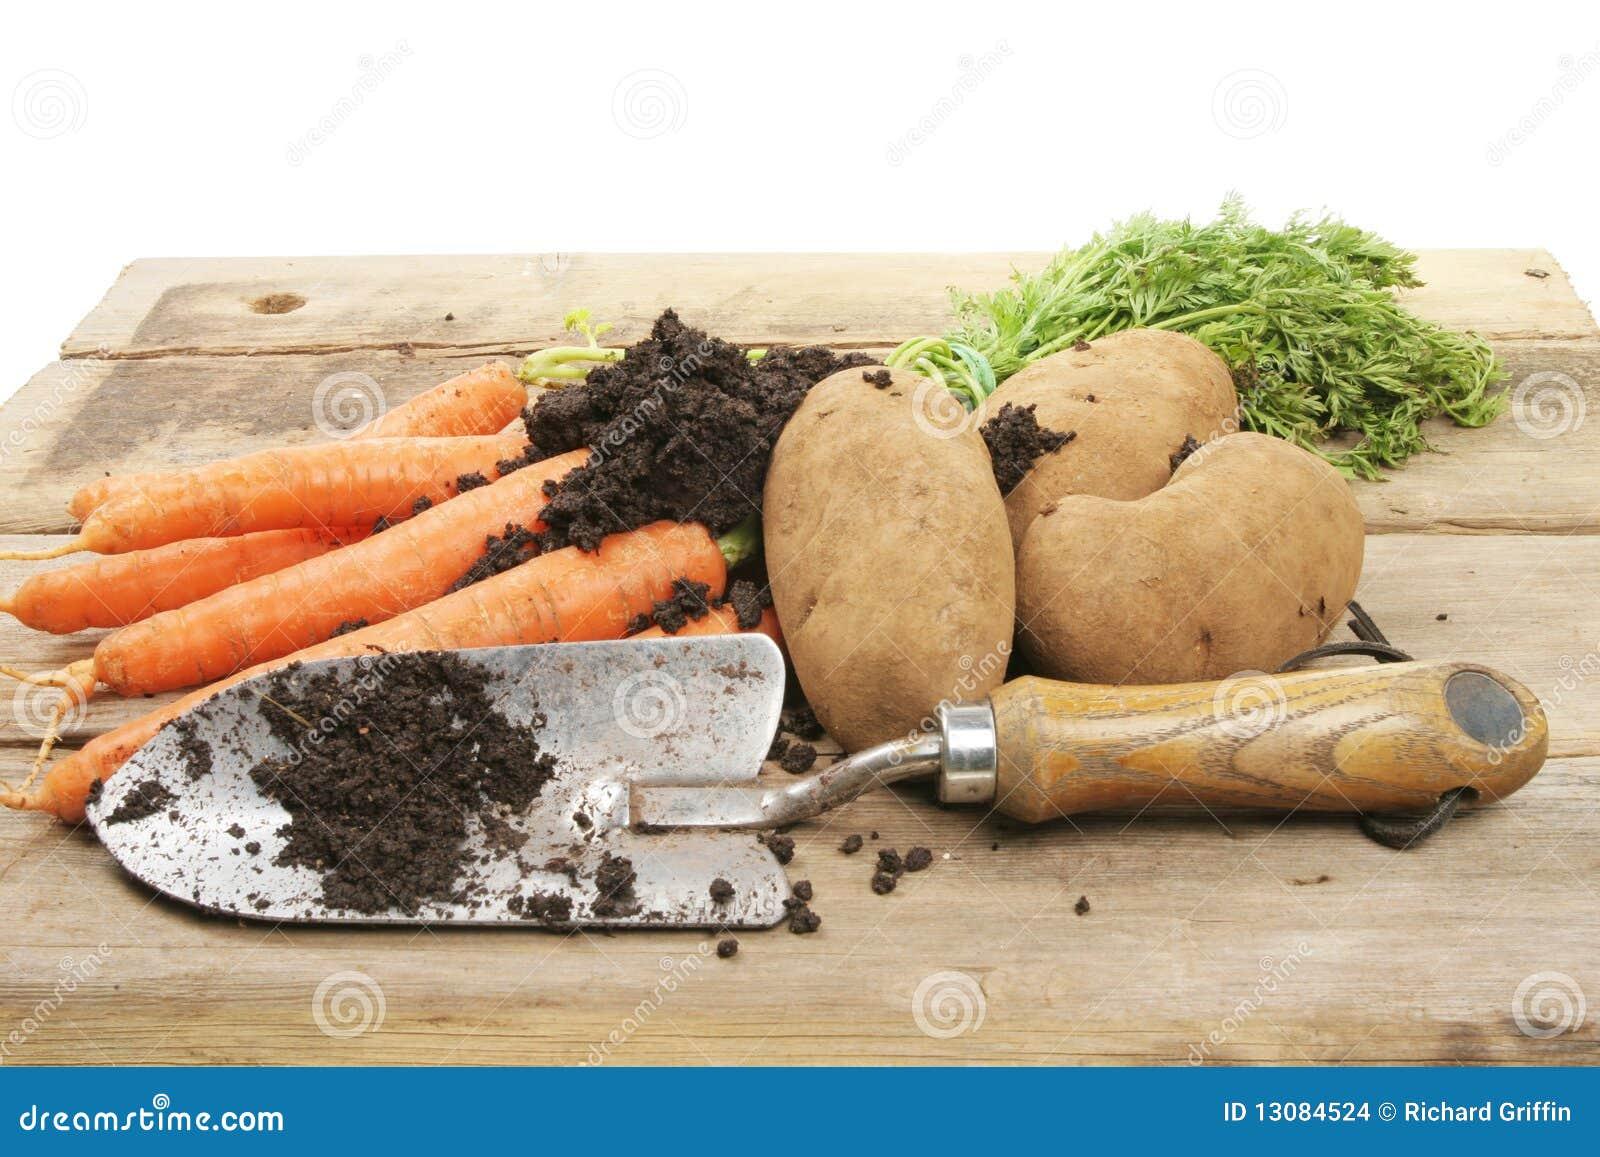 Freshly dug vegetables